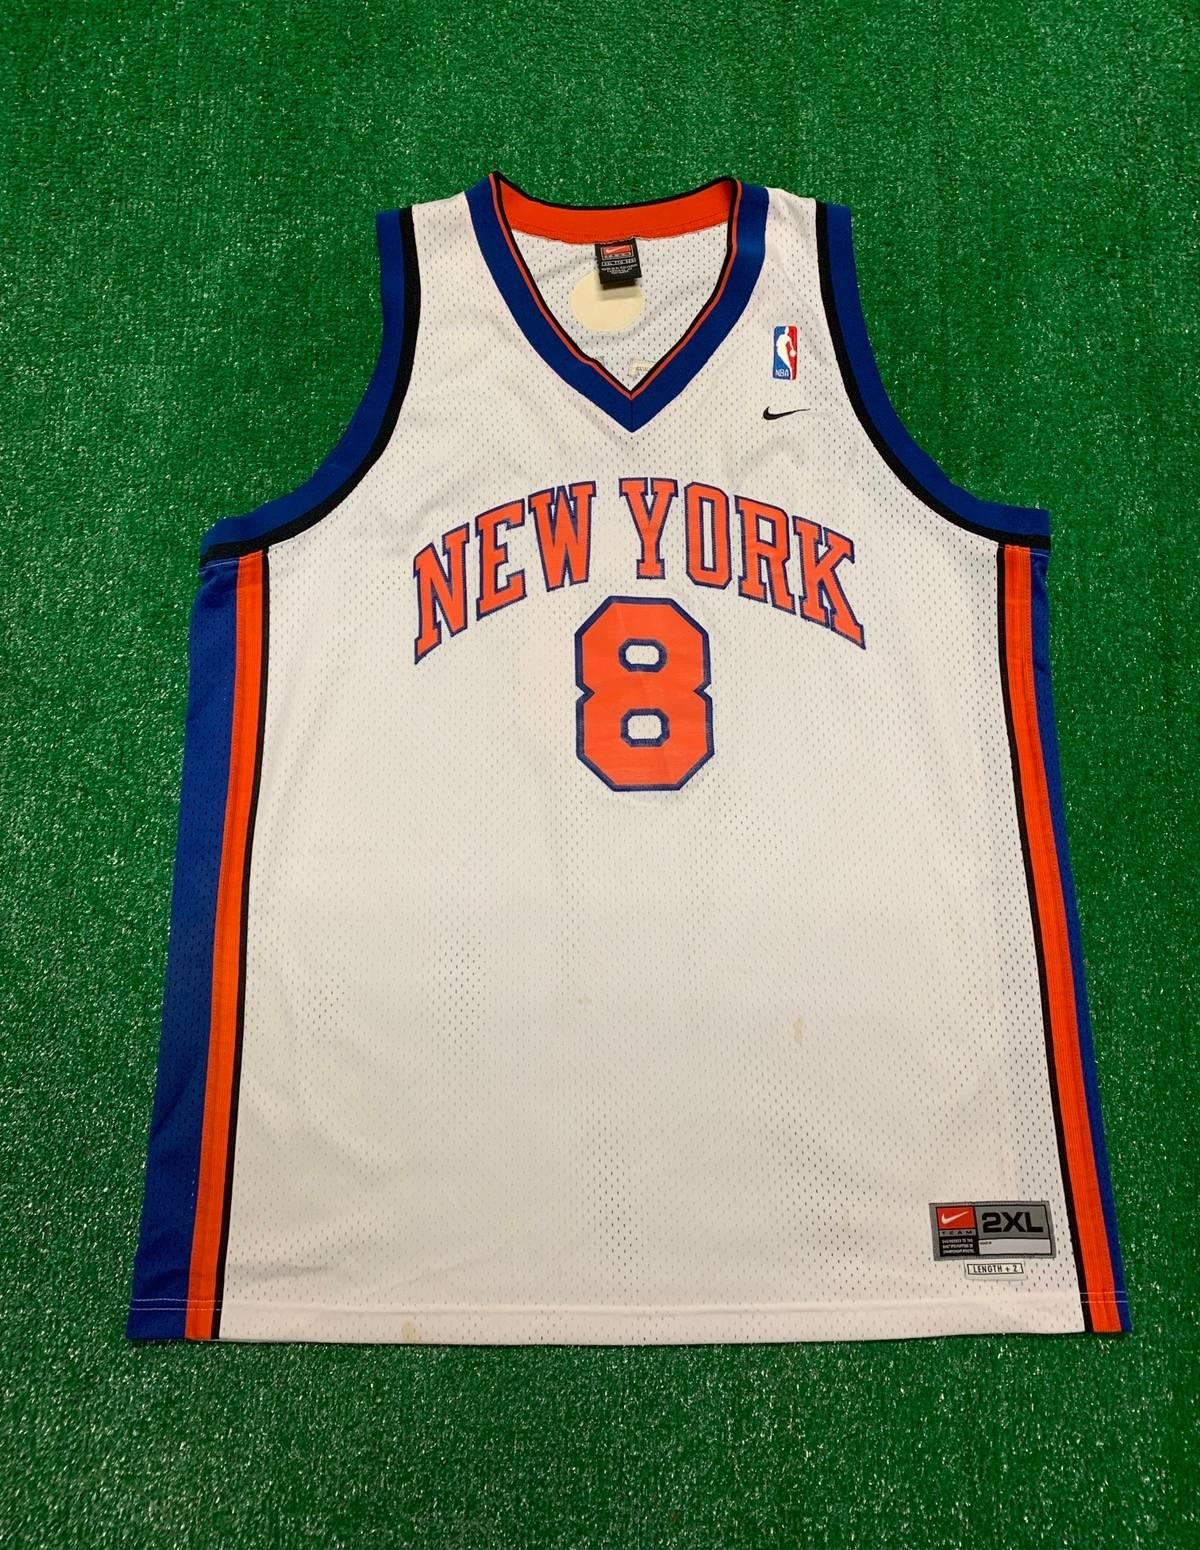 new style df1ce 2232e Jersey × Nike × Vintage Vintage Latrell Sprewell Swingman New York Knicks  Jersey Size Xxl $80